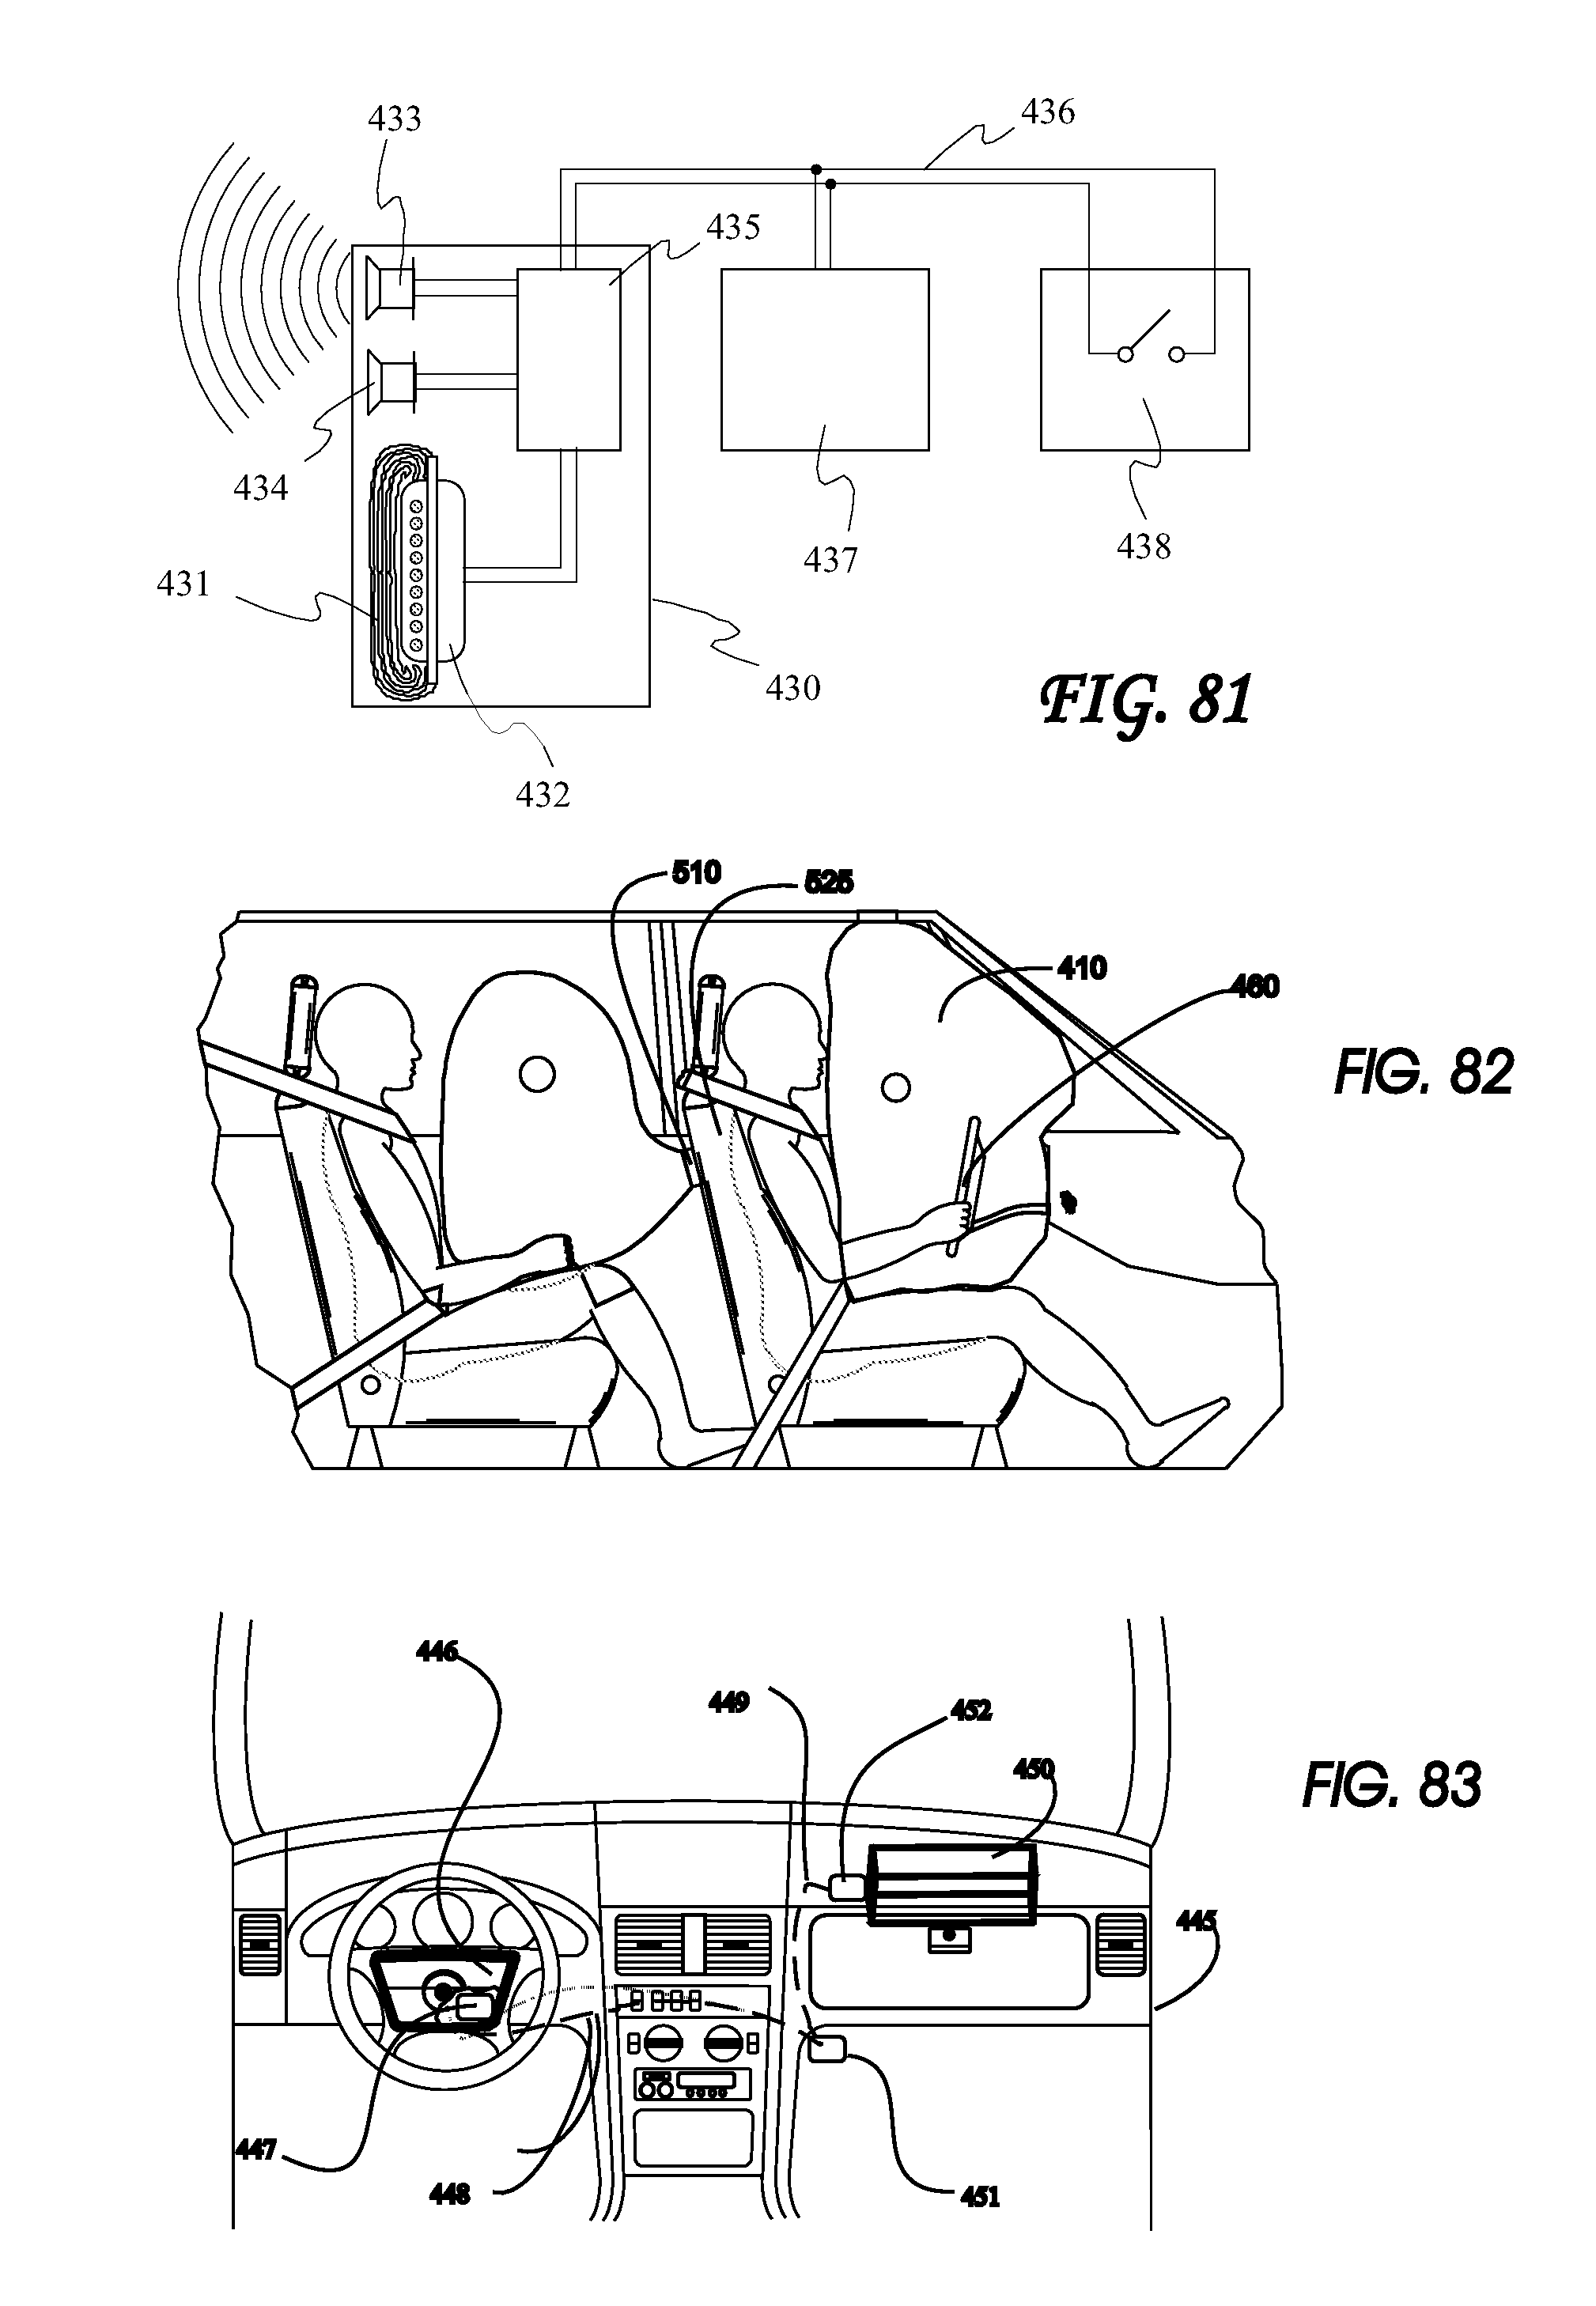 Patent US 8,019,501 B2